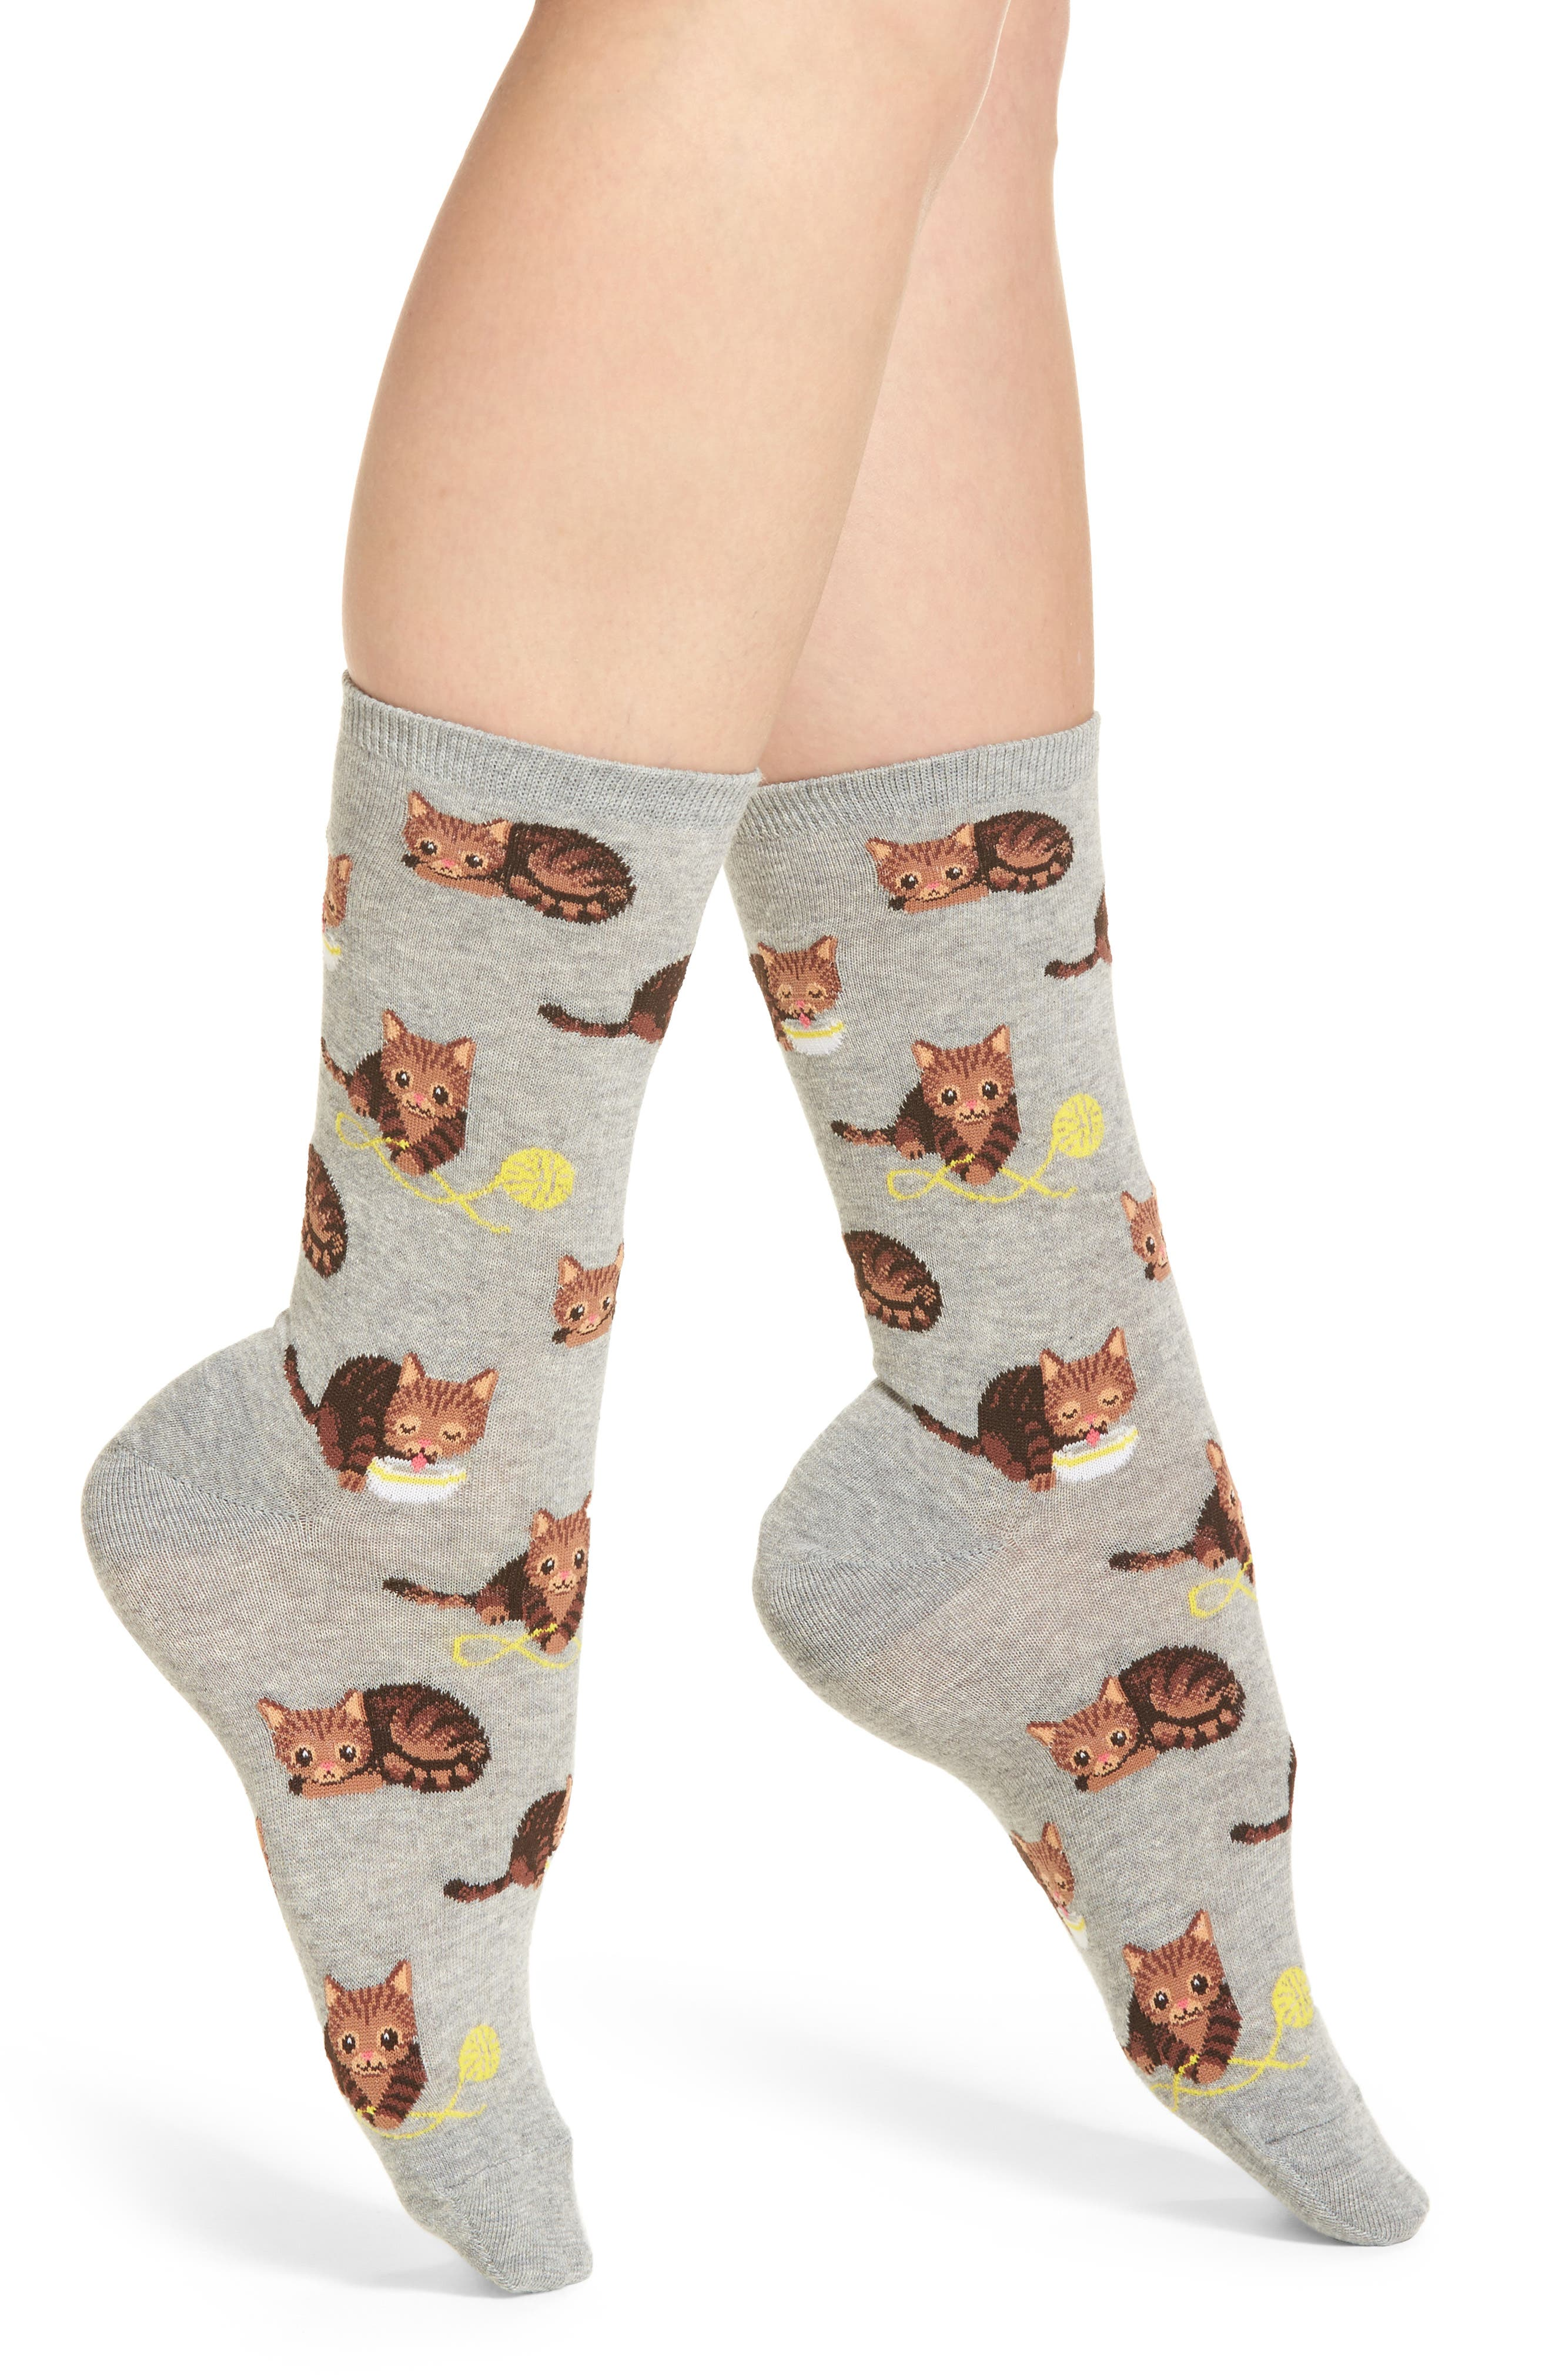 Cat & Yarn Crew Socks,                             Main thumbnail 1, color,                             Grey Heather